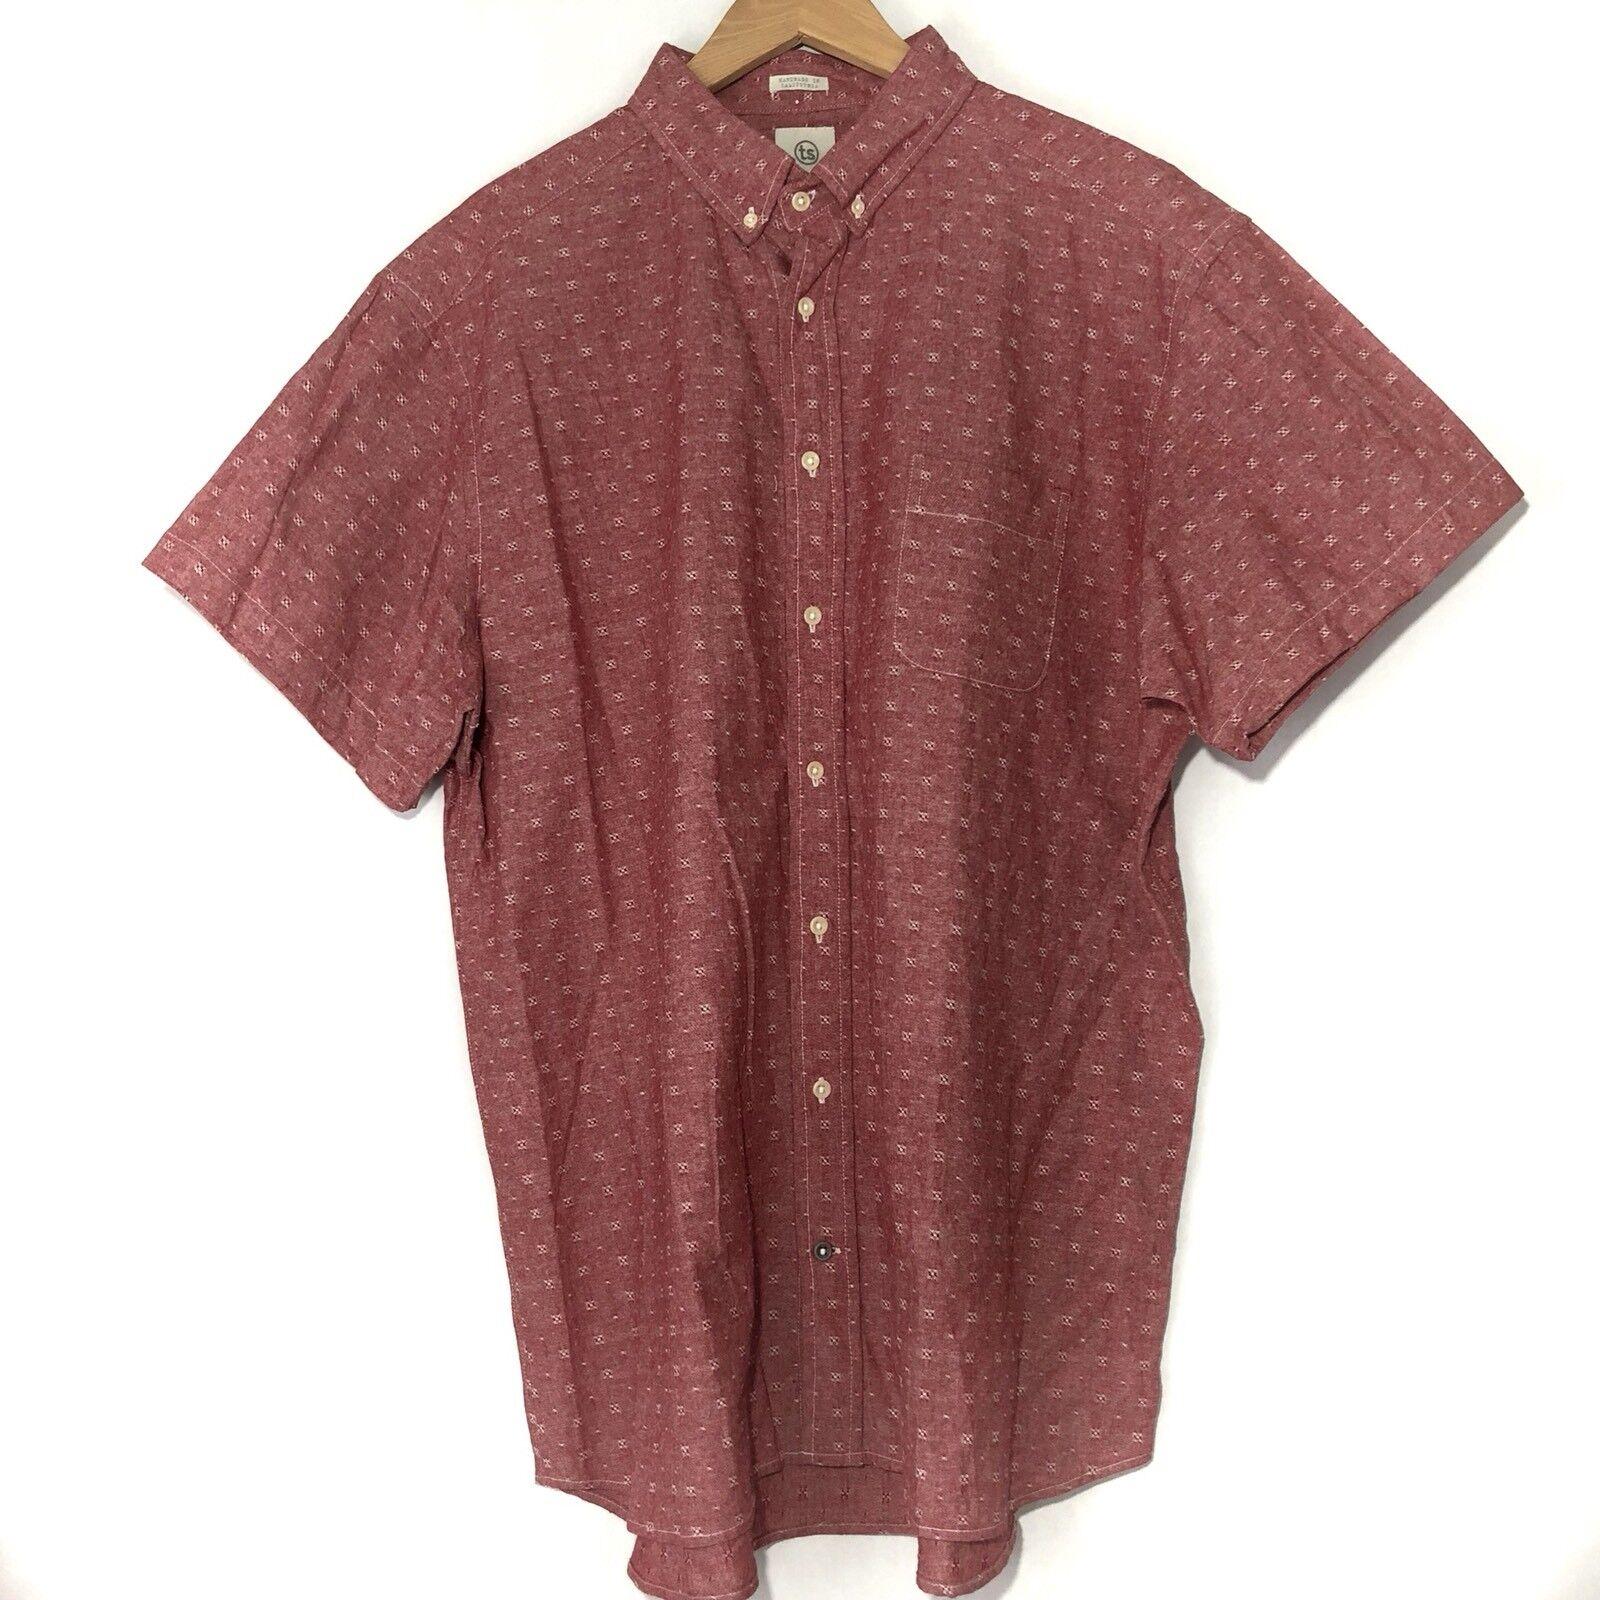 98c65d82c Taylor Stitch Mens Shirt Size 48 3XL XXXL Button Front Red Short Sleeve